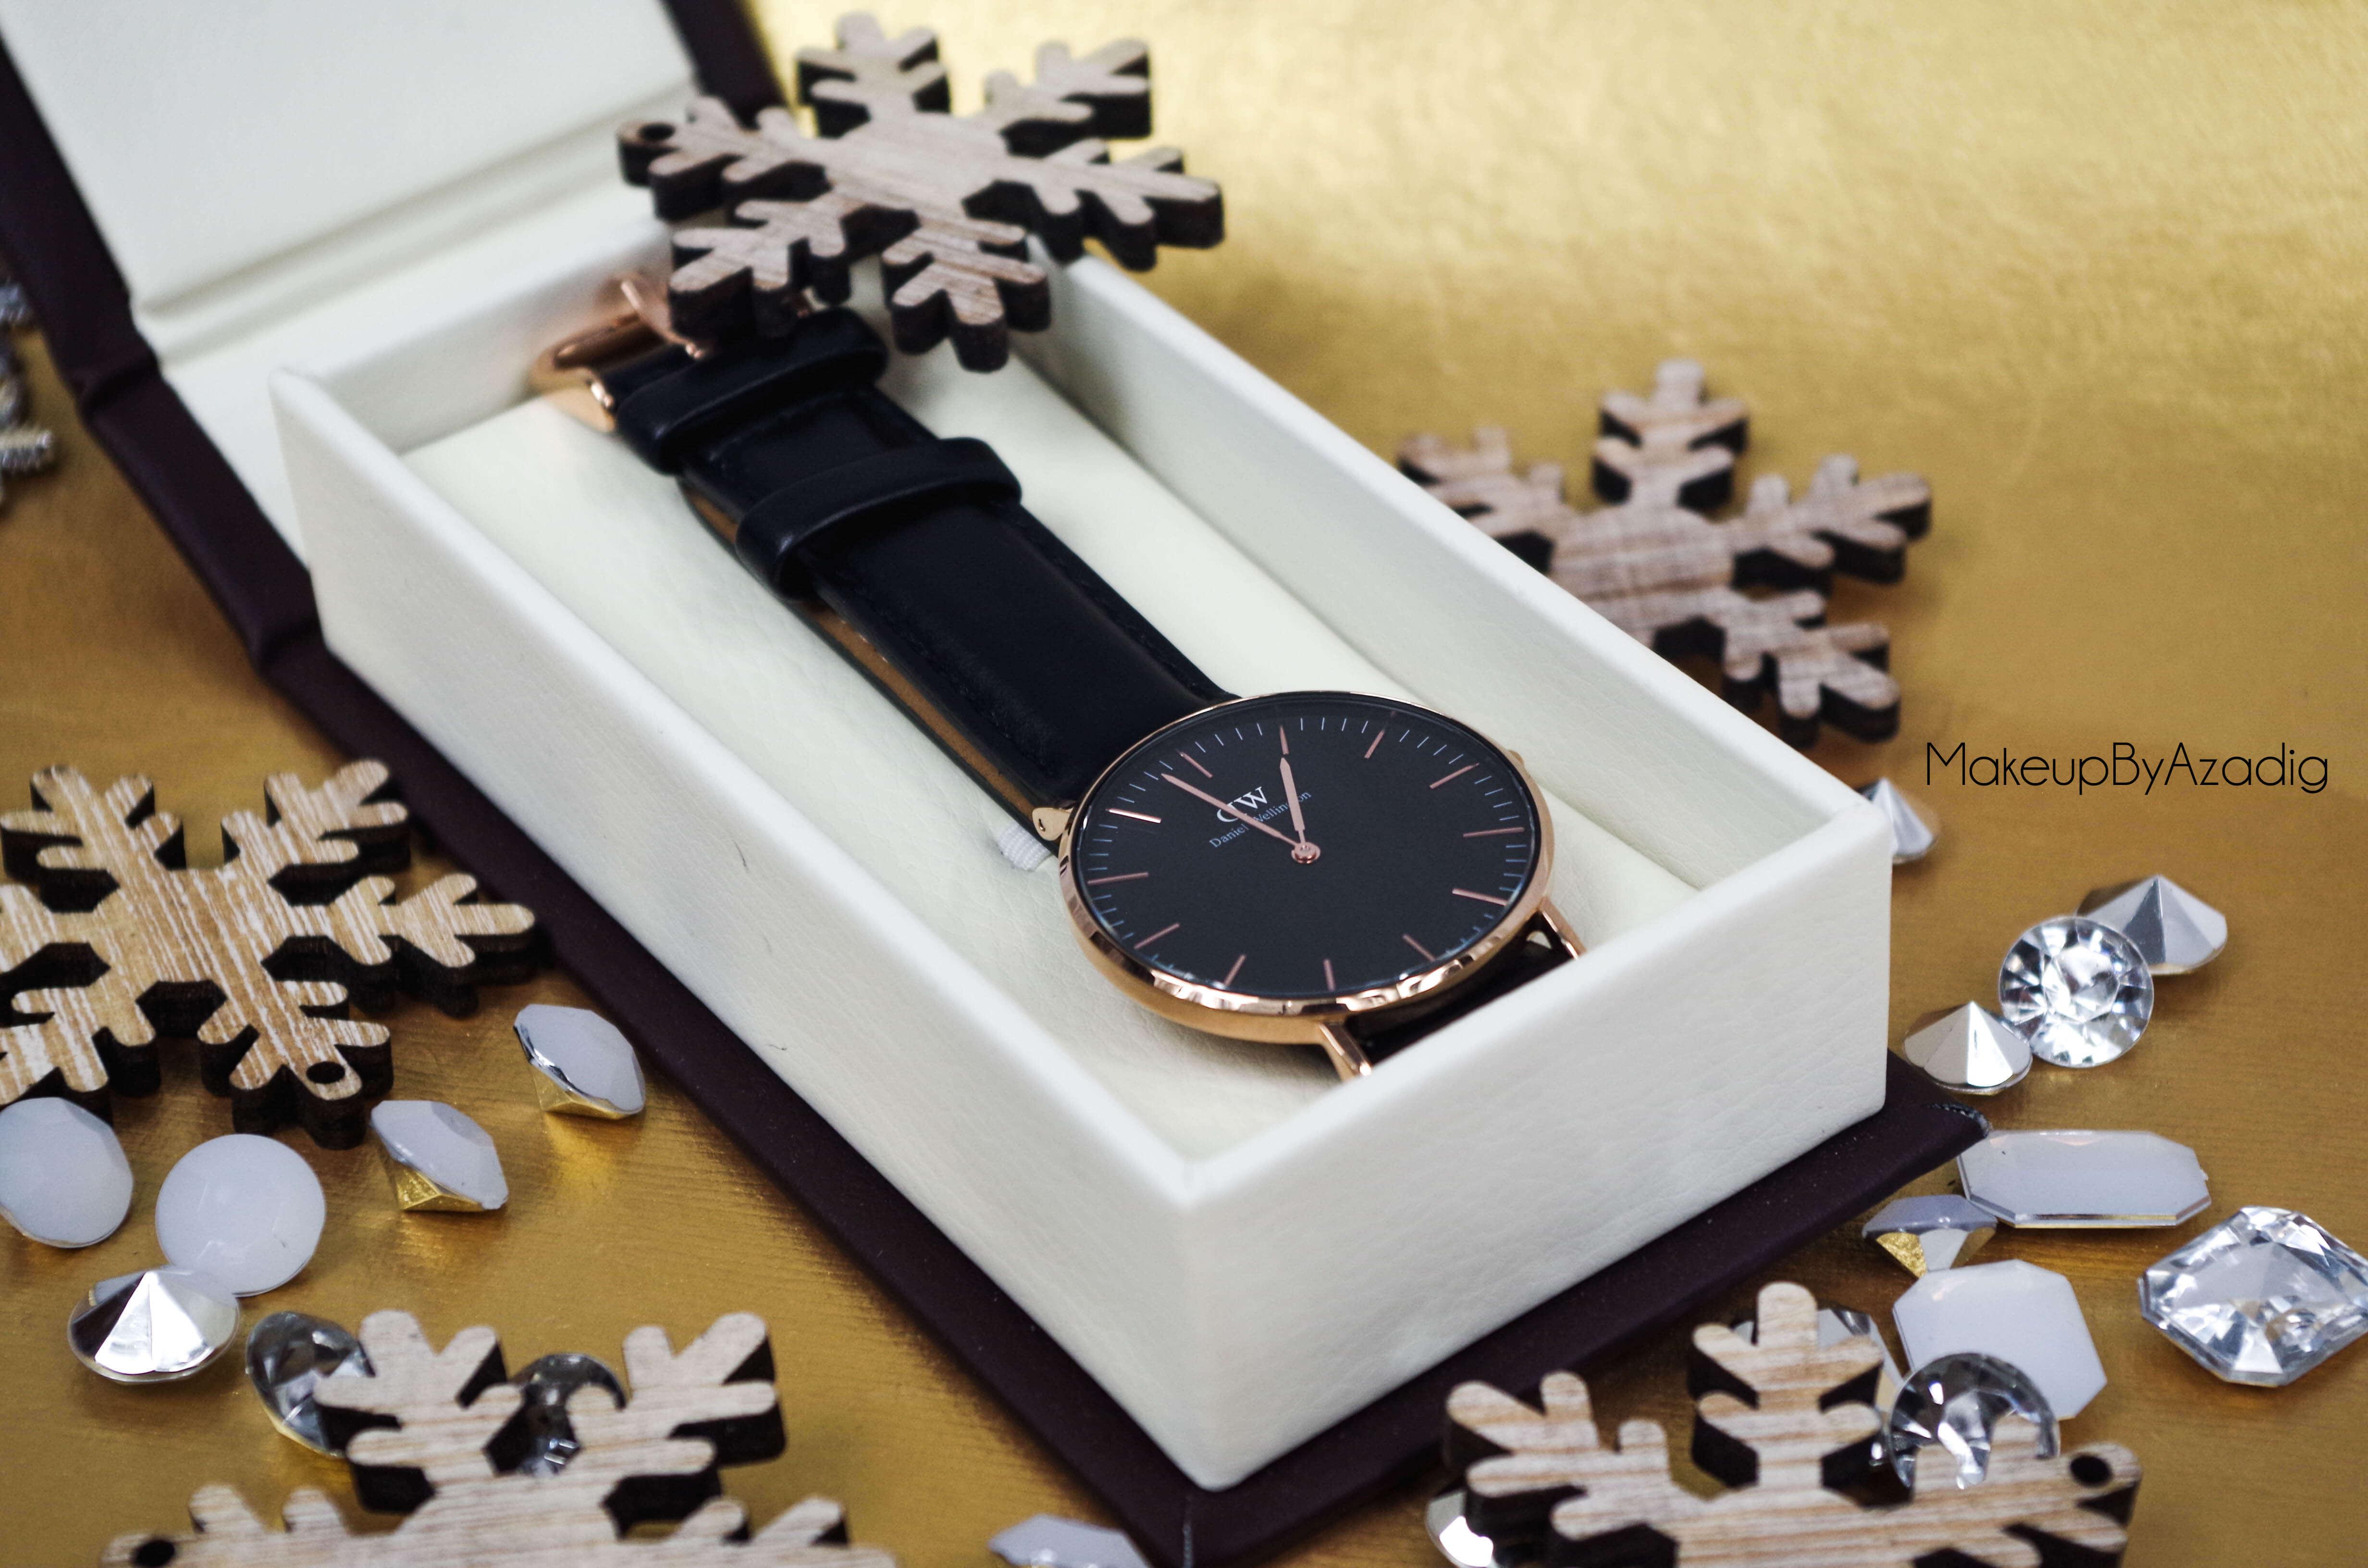 makeupbyazadig-daniel-wellington-montre-classic-black-sheffield-code-promo-troyes-paris-chic